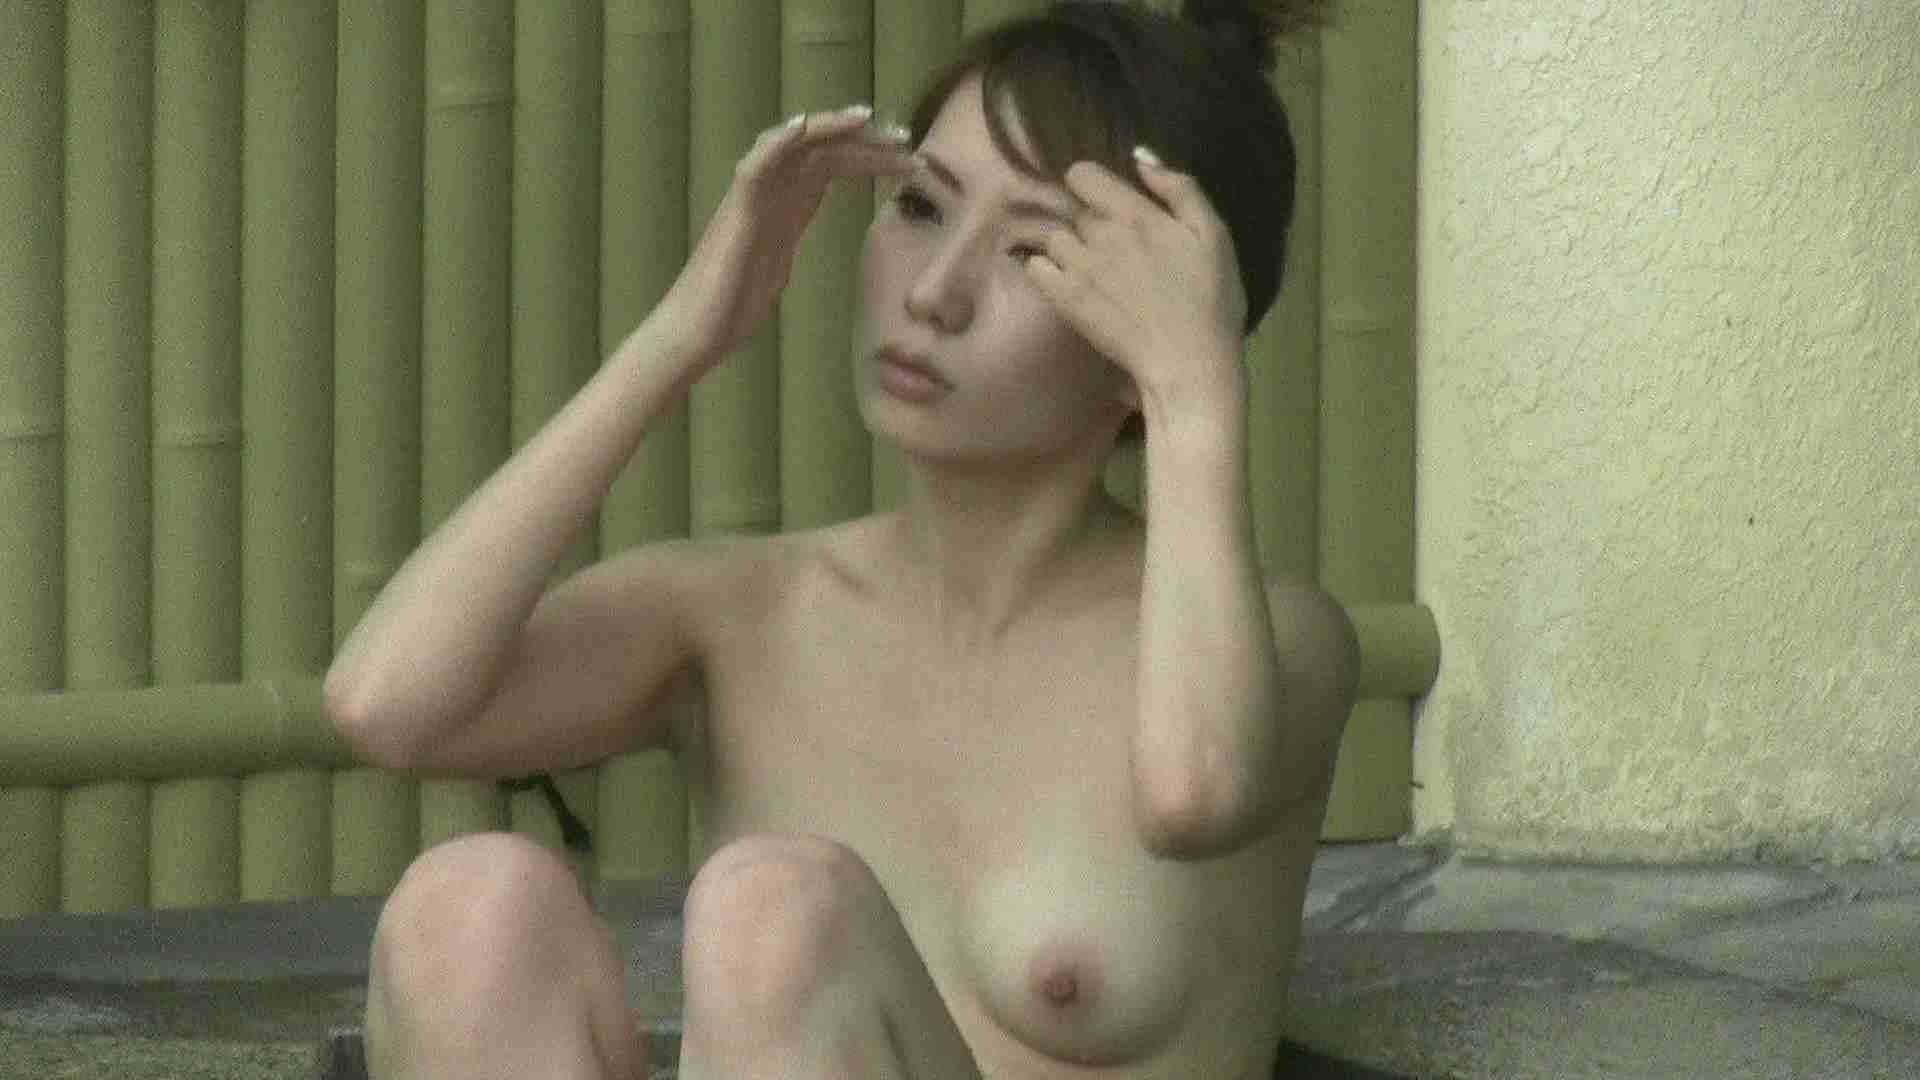 Aquaな露天風呂Vol.208 盗撮 隠し撮りオマンコ動画紹介 85画像 62